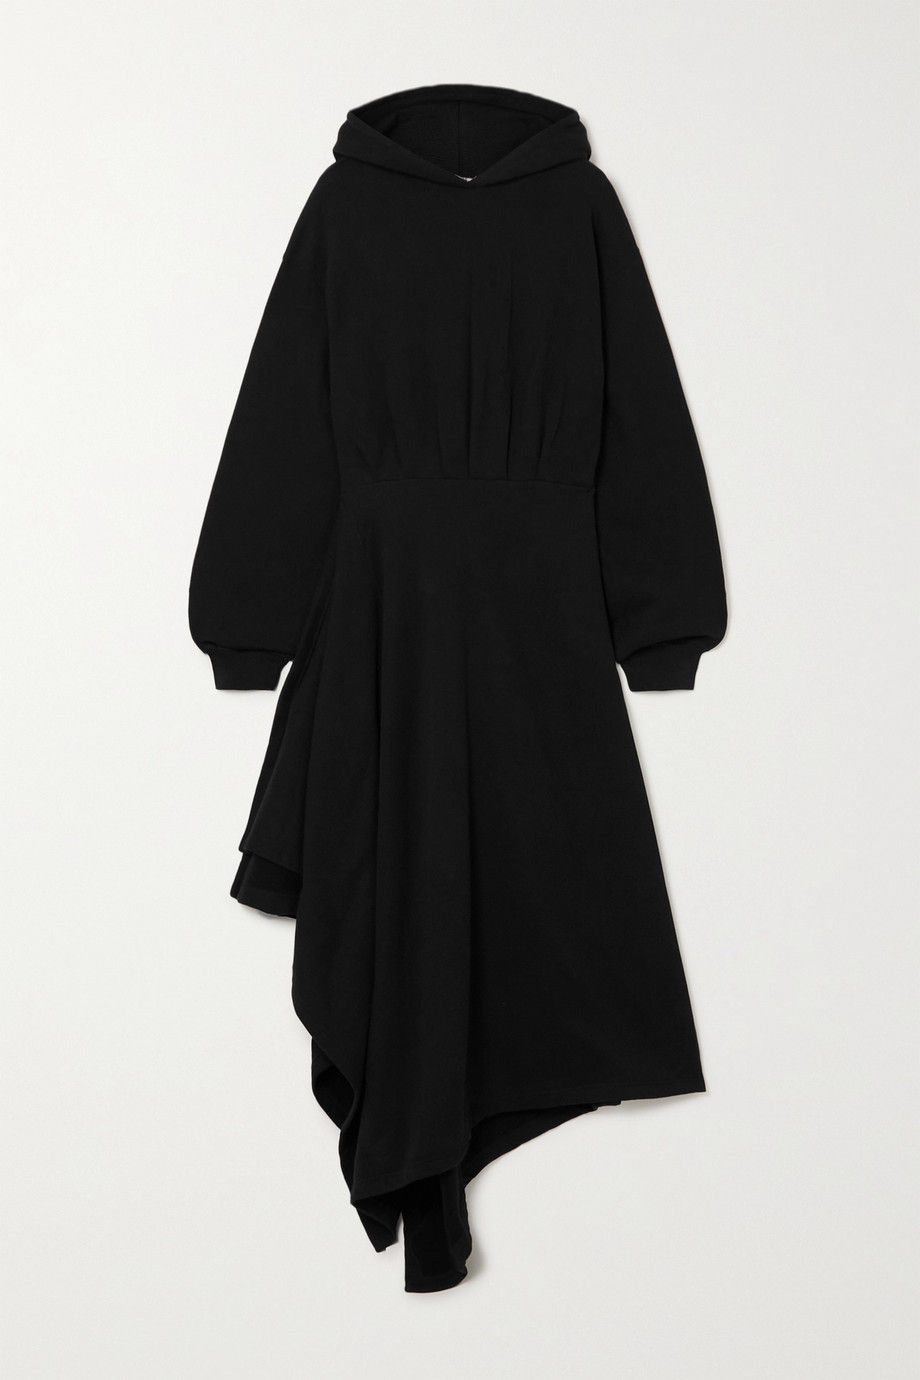 Balenciaga Robe portefeuille asymétrique à capuche en jersey de coton